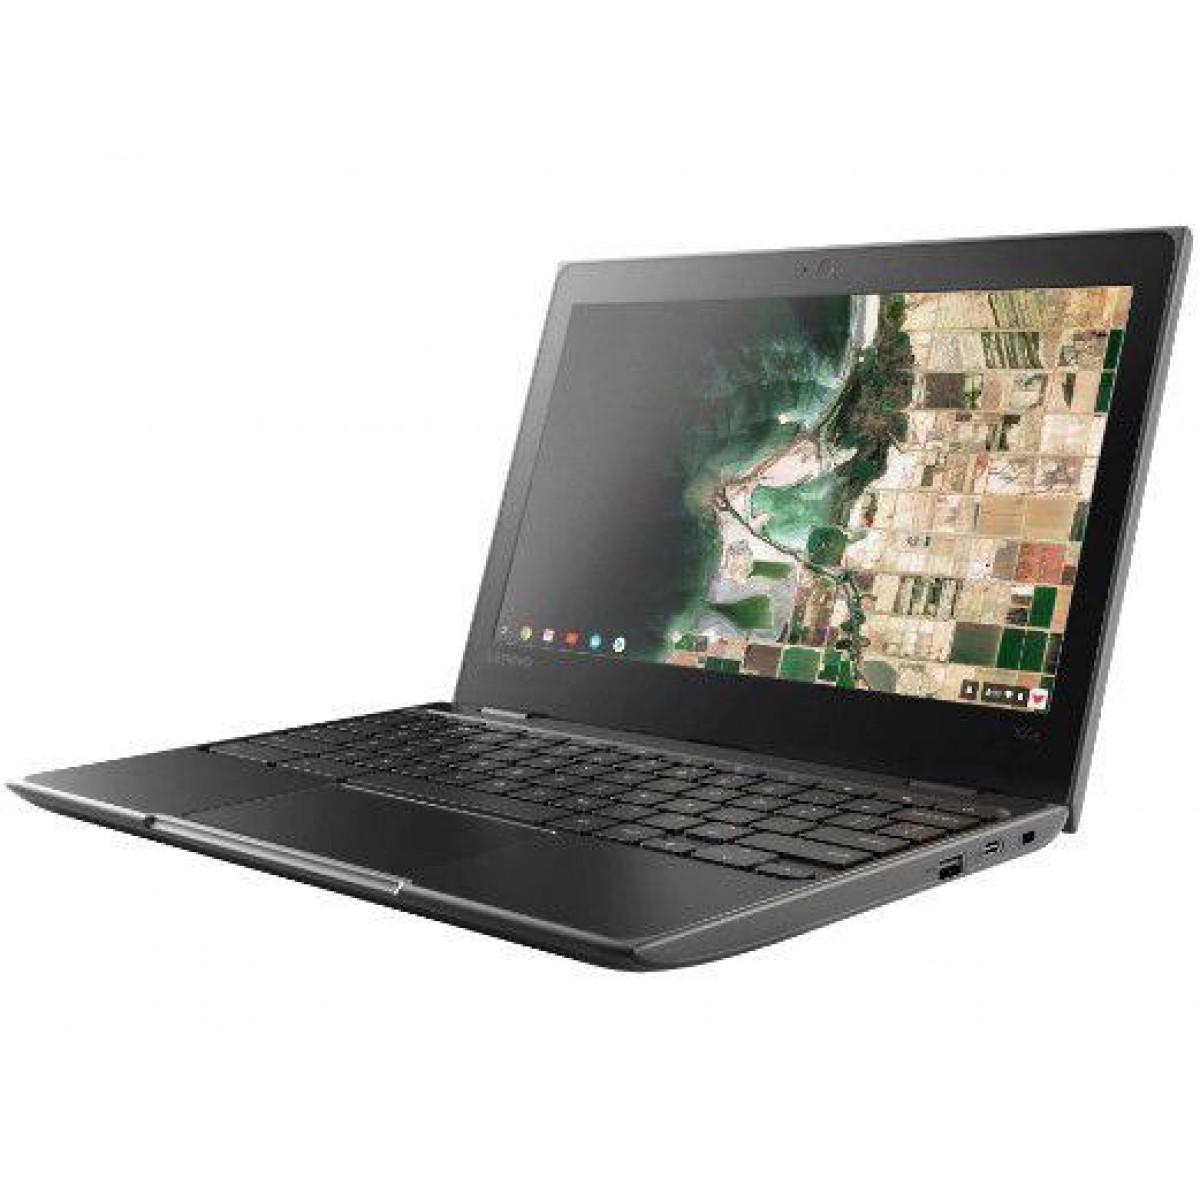 "Chromebook Lenovo E100 Intel Celeron N4000, 4GB DDR4, 32GB, 11,6"", ChromeOS, 81MA000QBR"